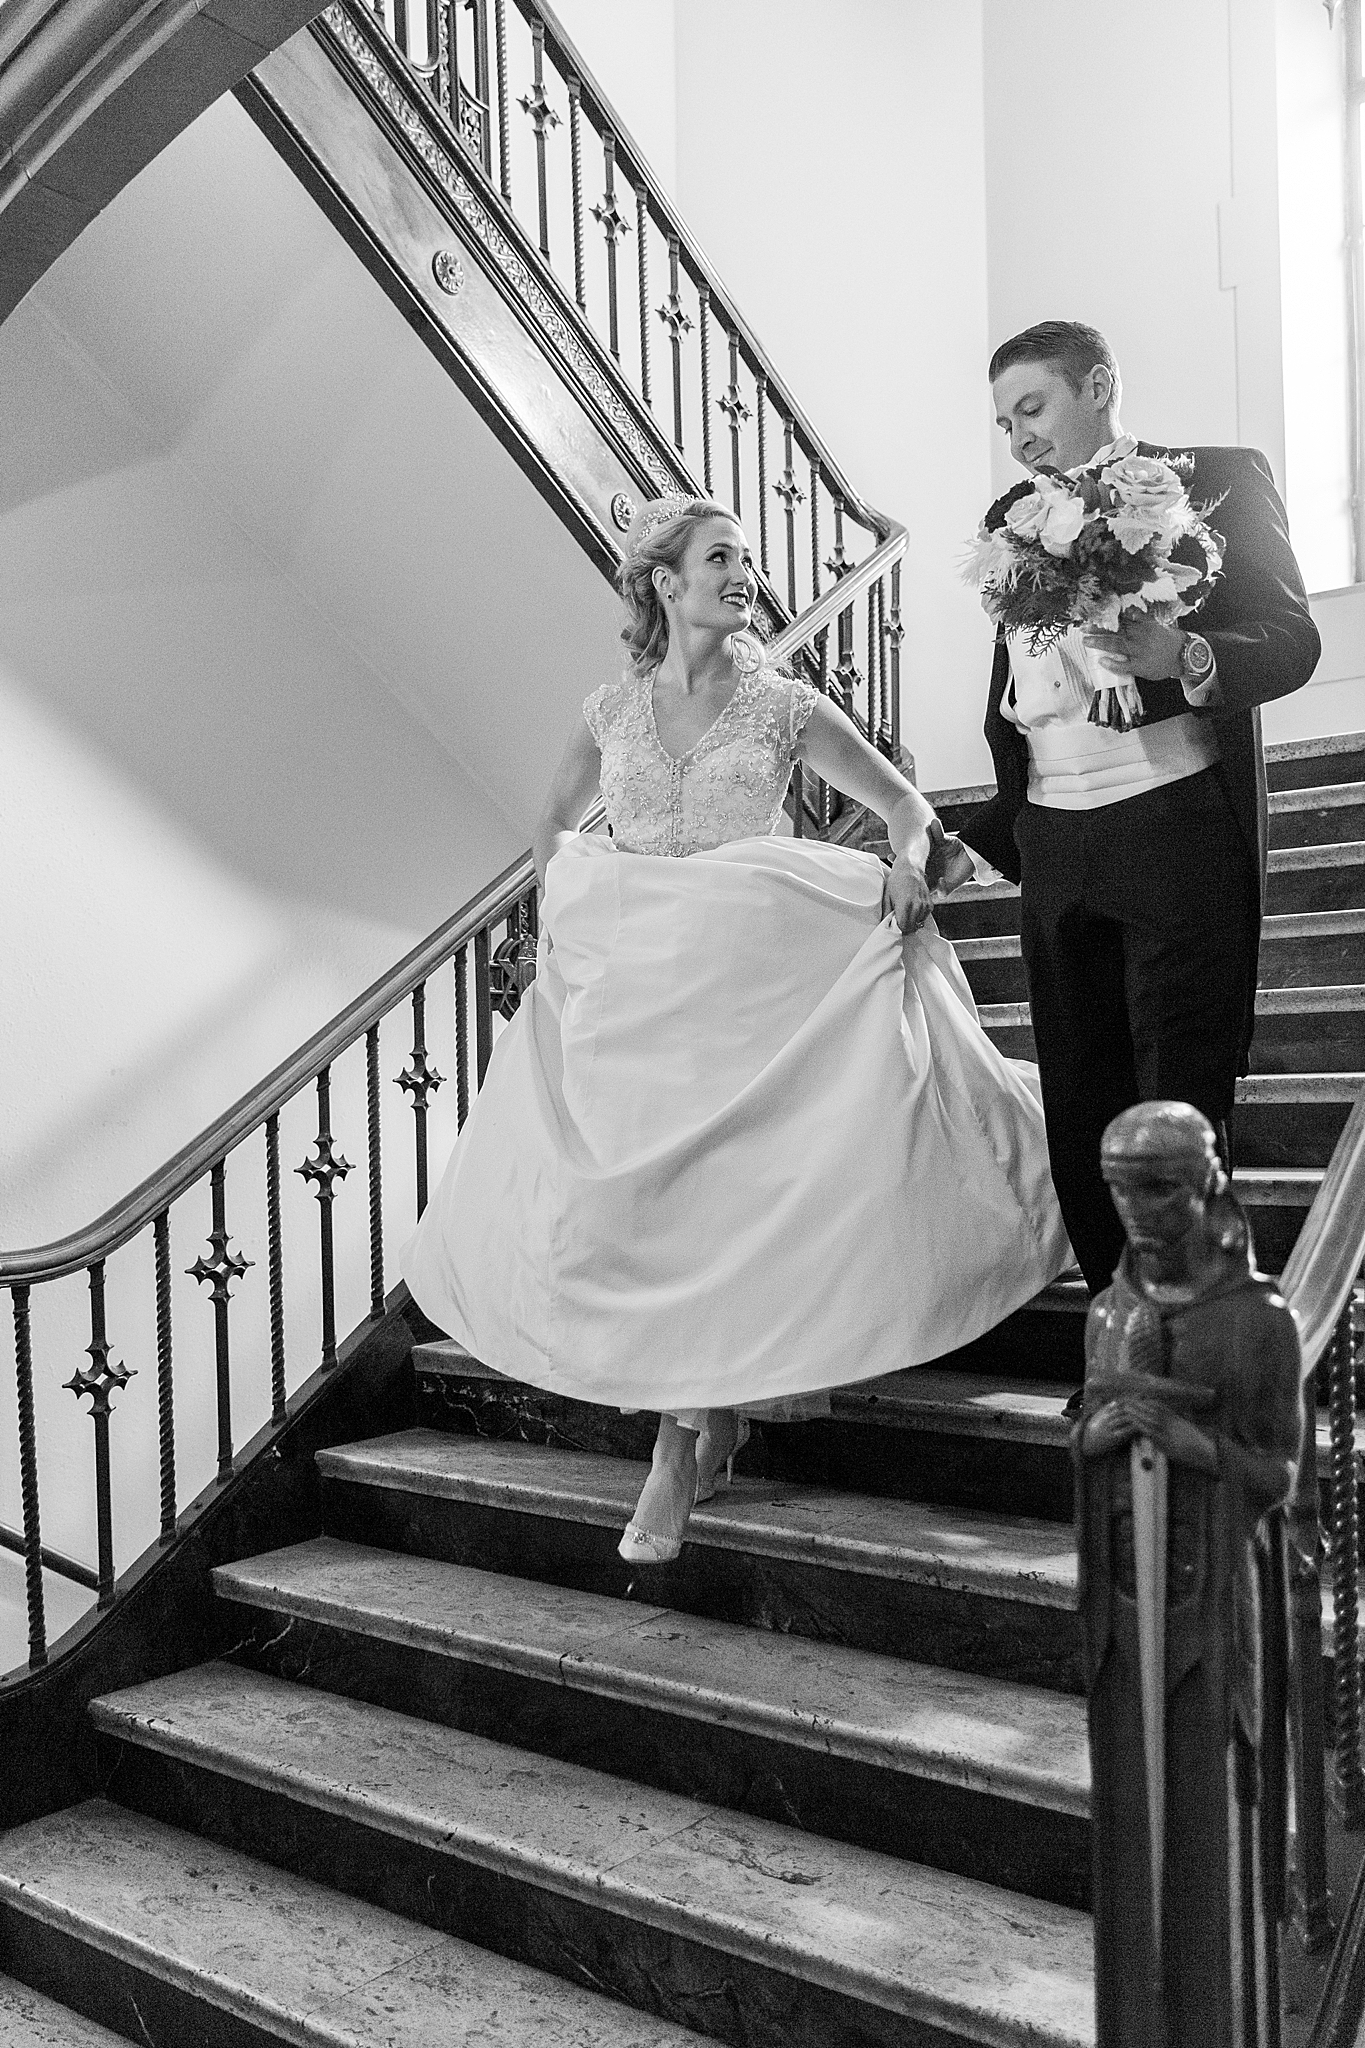 detroit-wedding-photographer-detroit-masonic-temple-by-courtney-carolyn-photography_0001.jpg